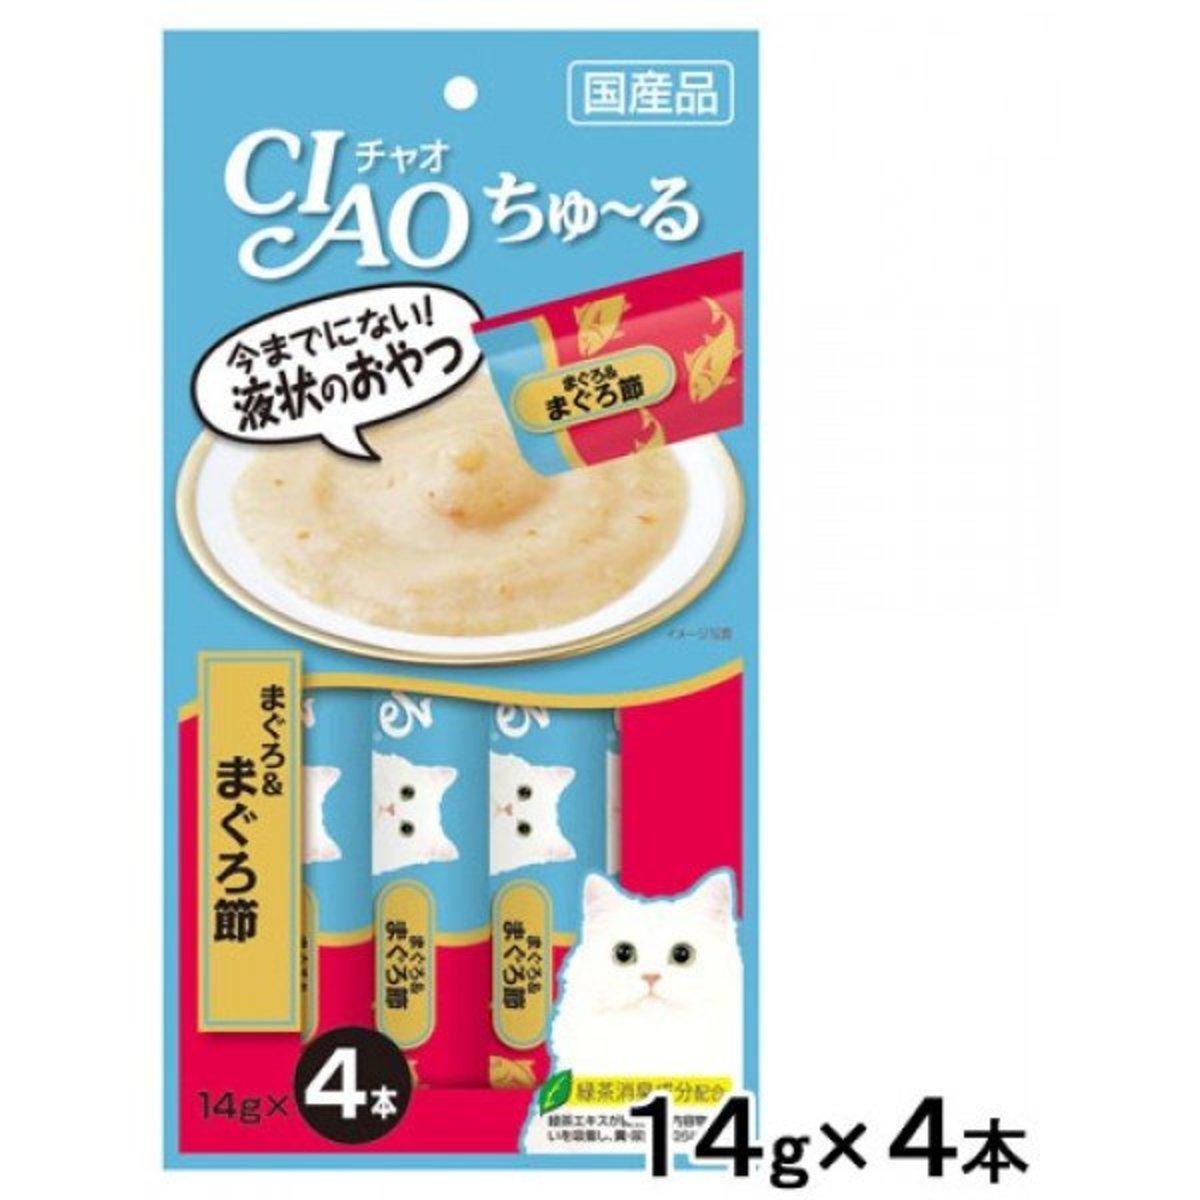 Japanese CIAO meat meal meal tuna + dried tuna paste 56g (SC-141) sky blue